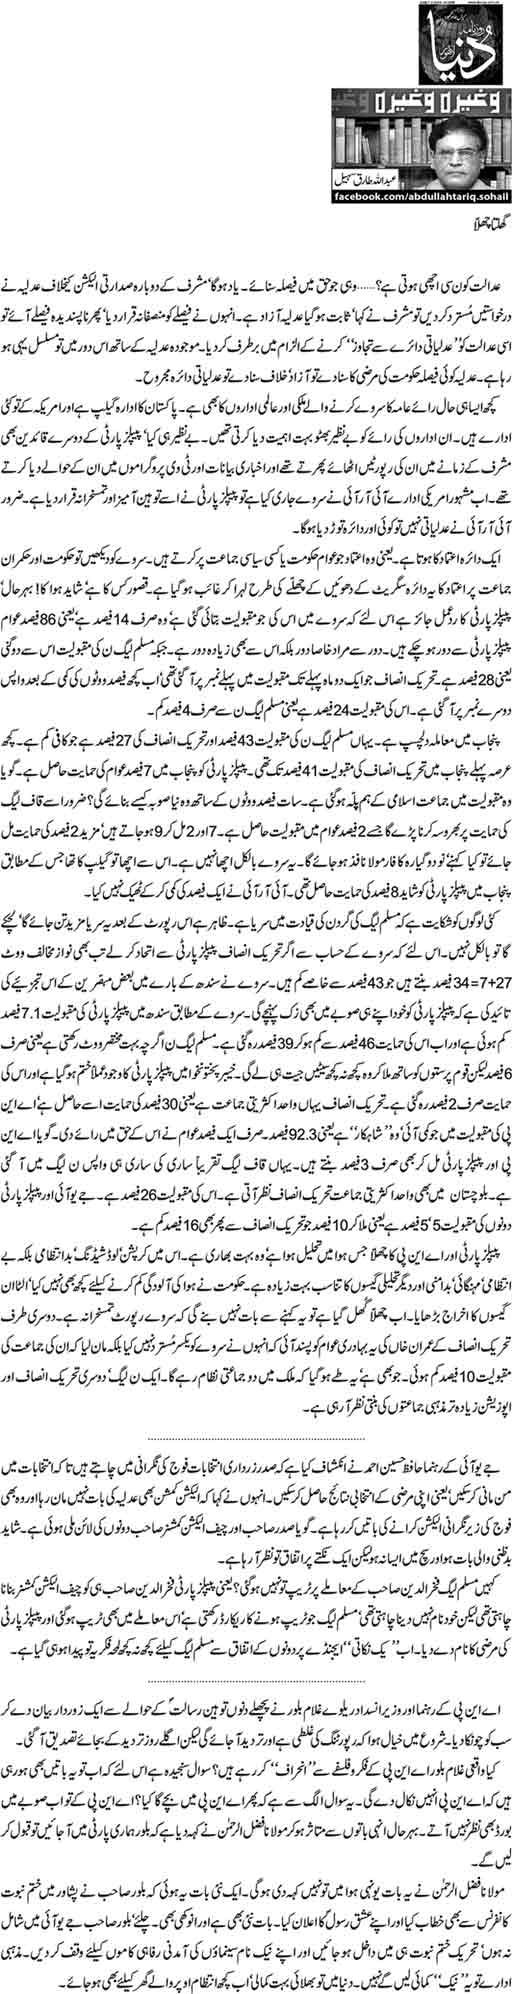 Ghula Challa - Abdullah Tariq Sohail